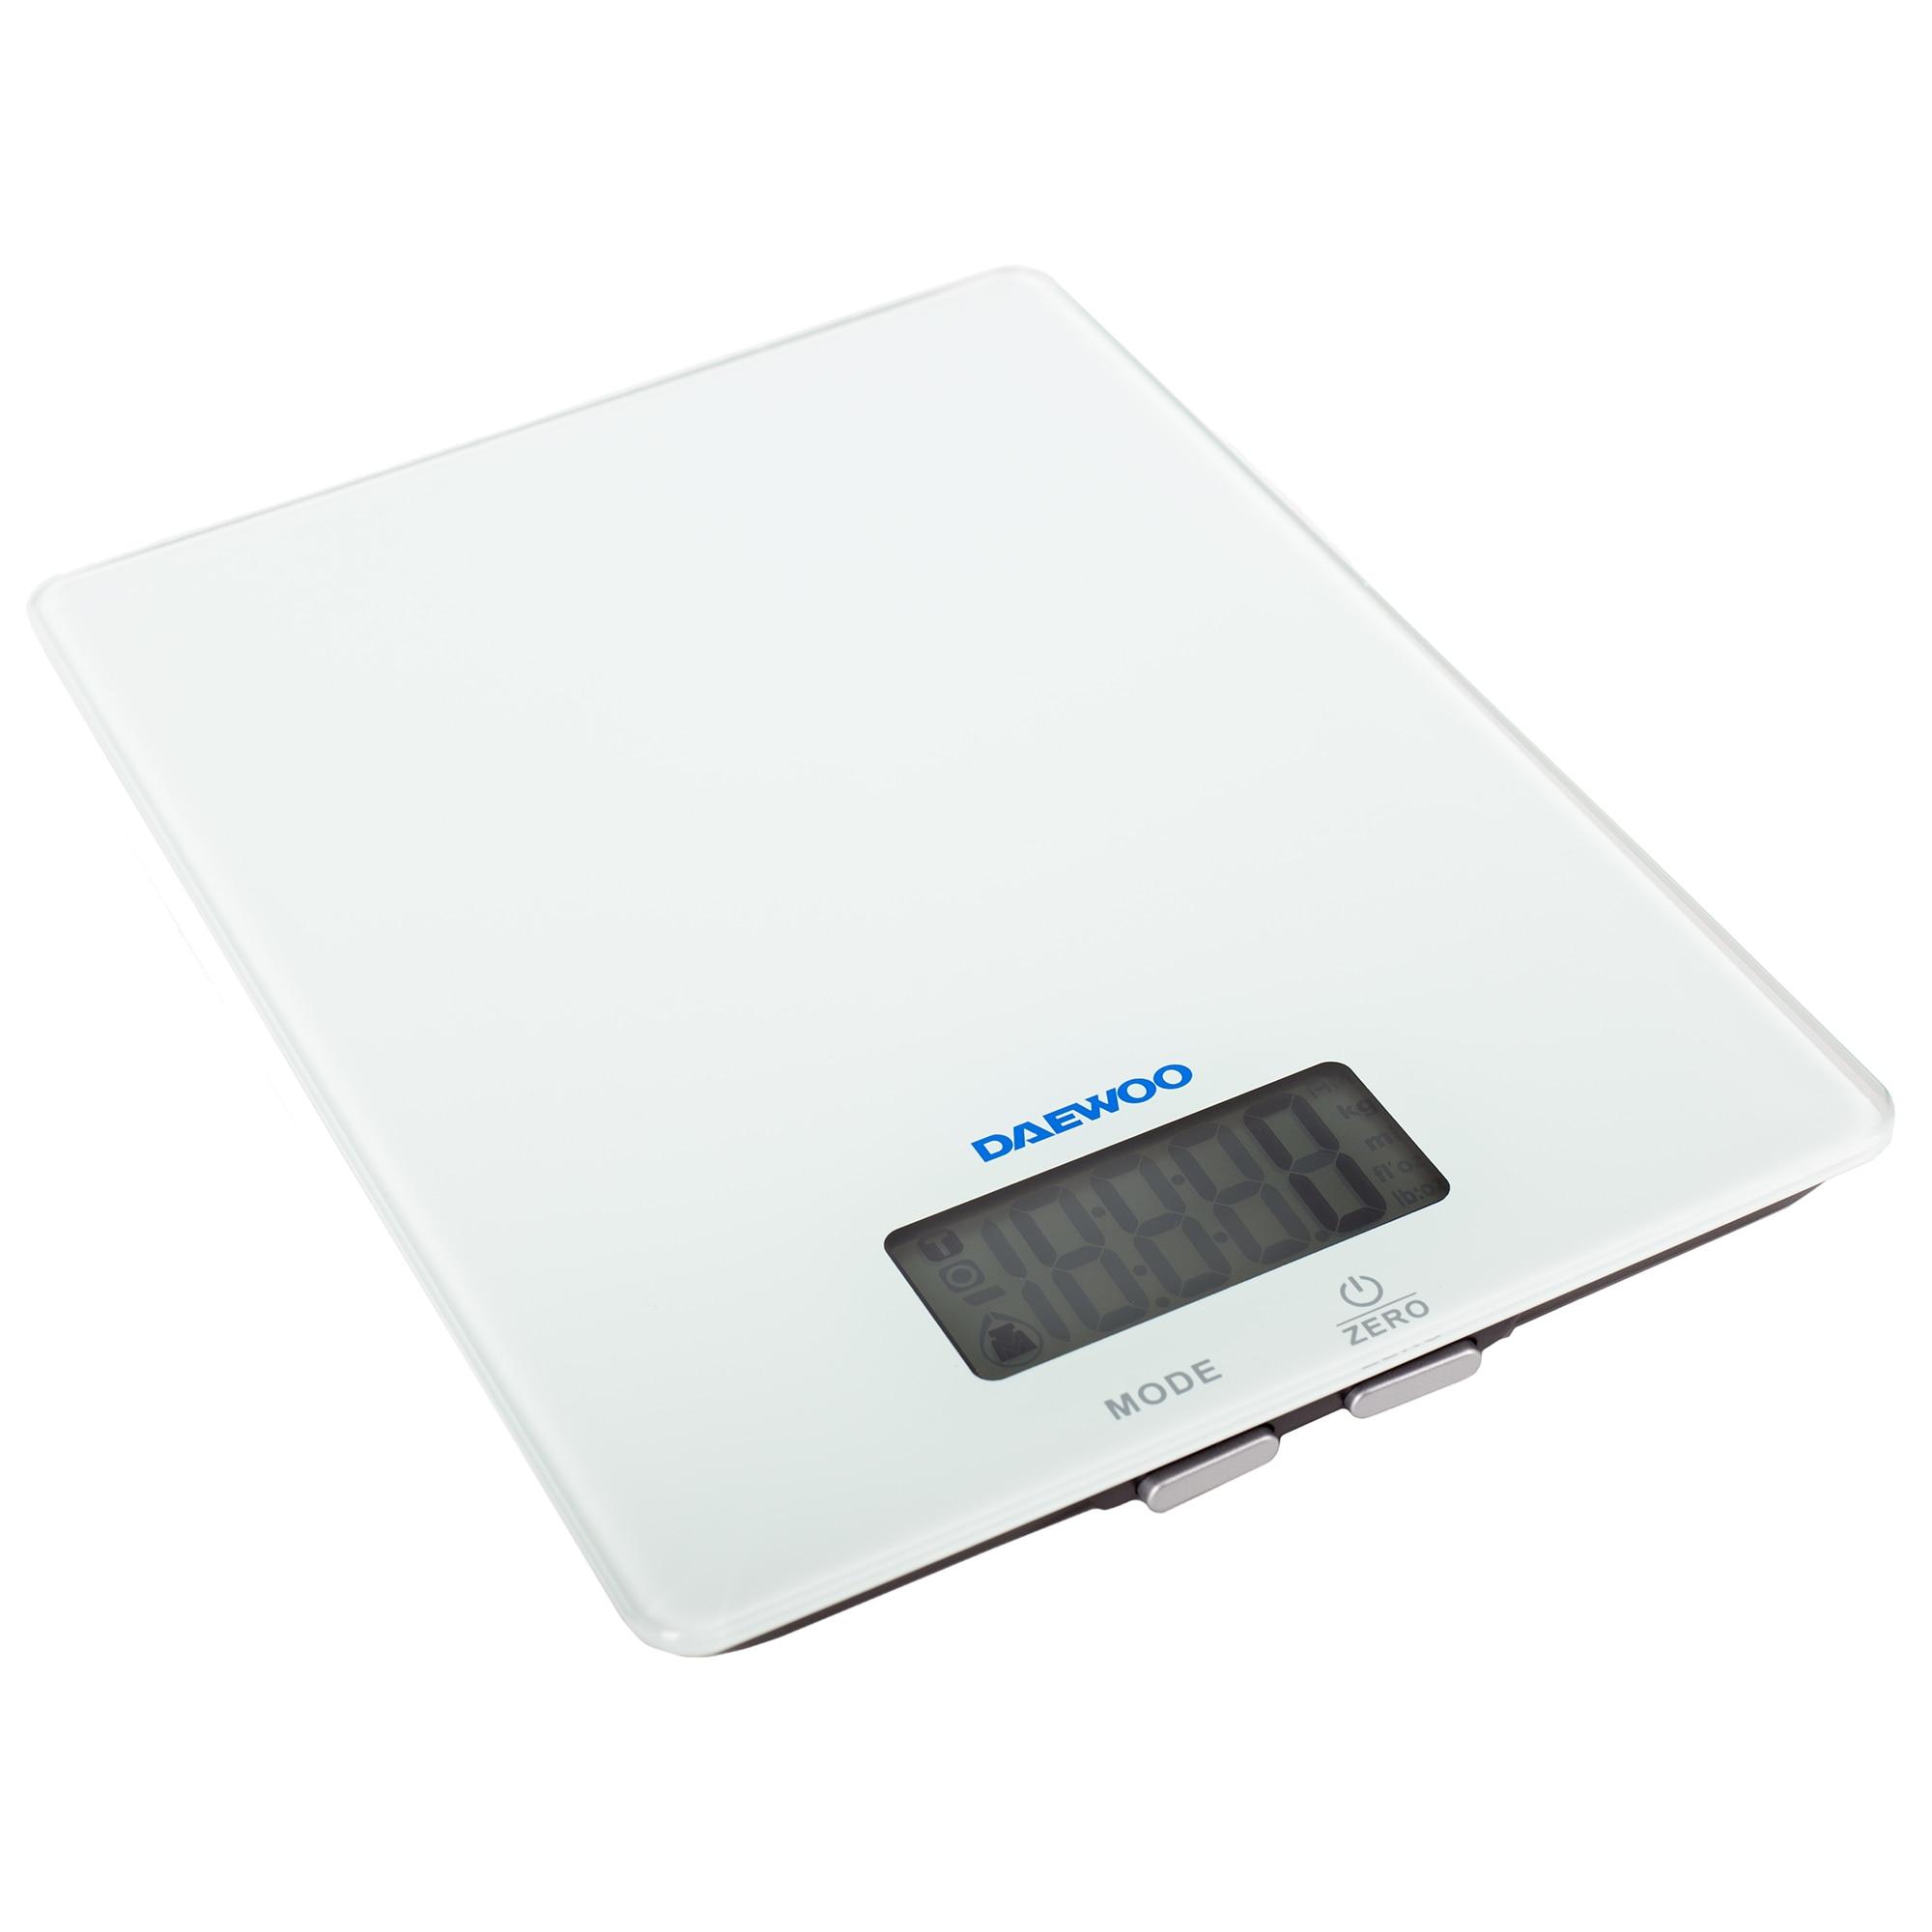 Fotografie Cantar nutritional cu Bluetooth Daewoo DKS20B, 5 kg, 1 g, sticla 4 mm, afisaj LCD, app iOS, Alb